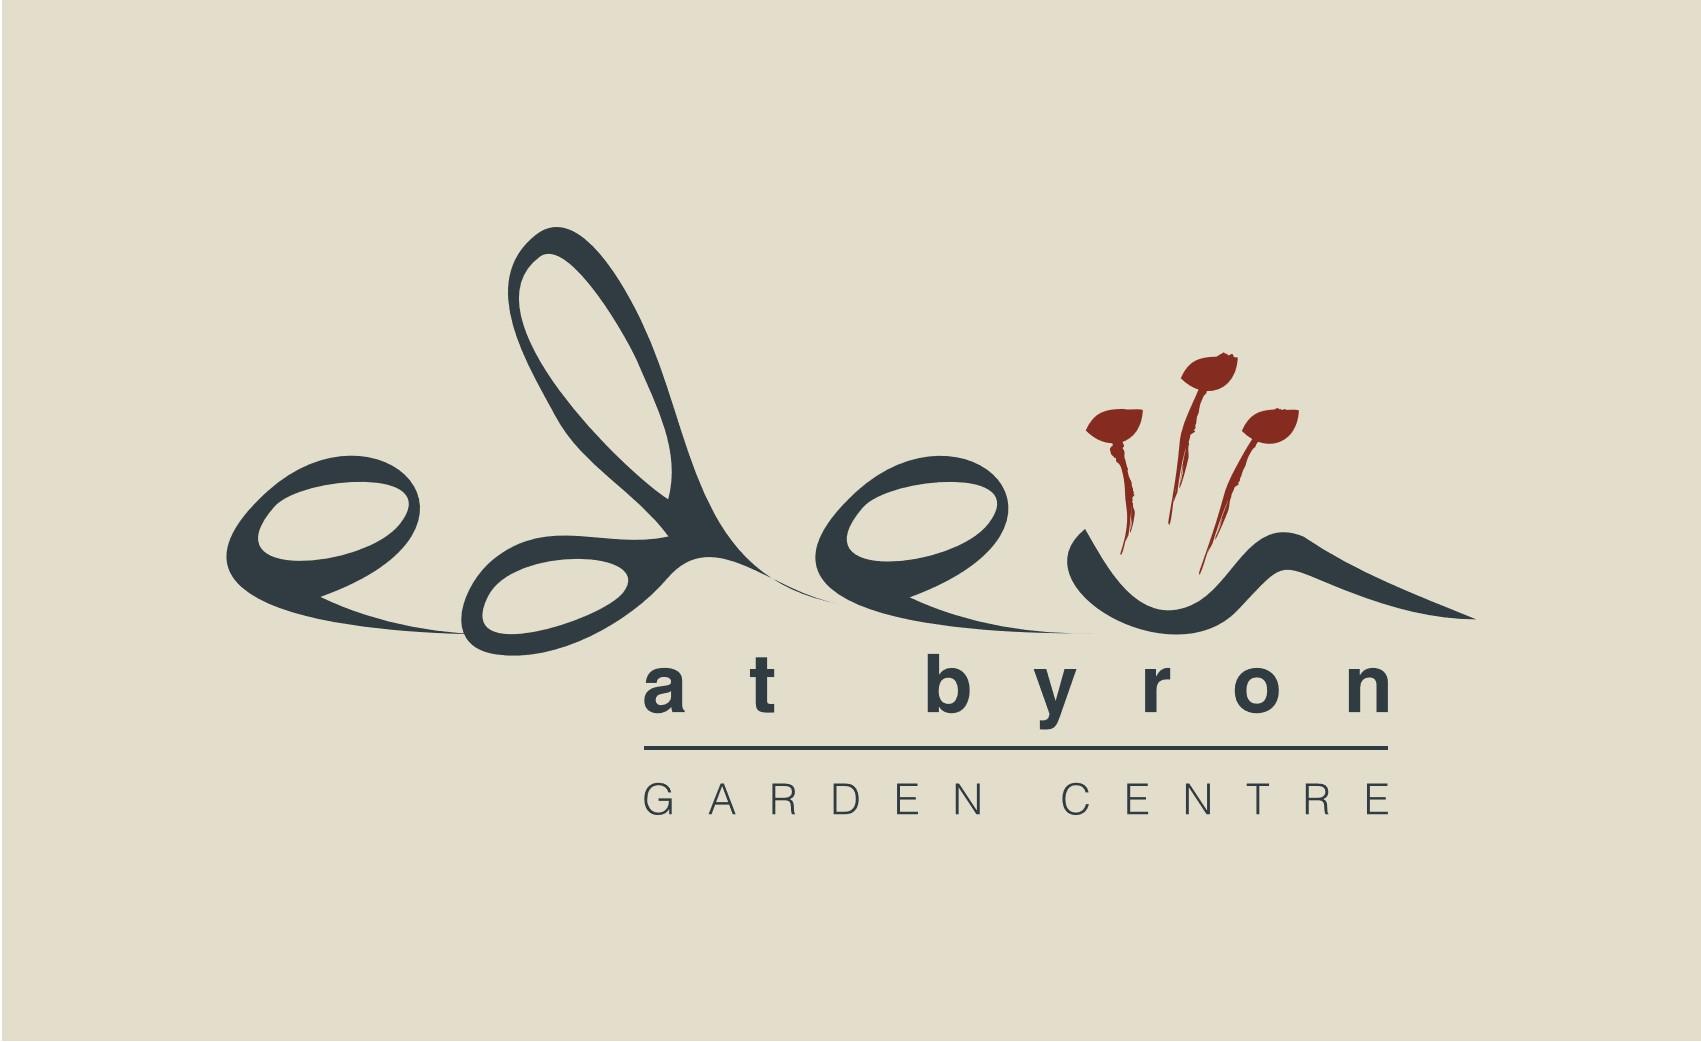 Eden at Byron